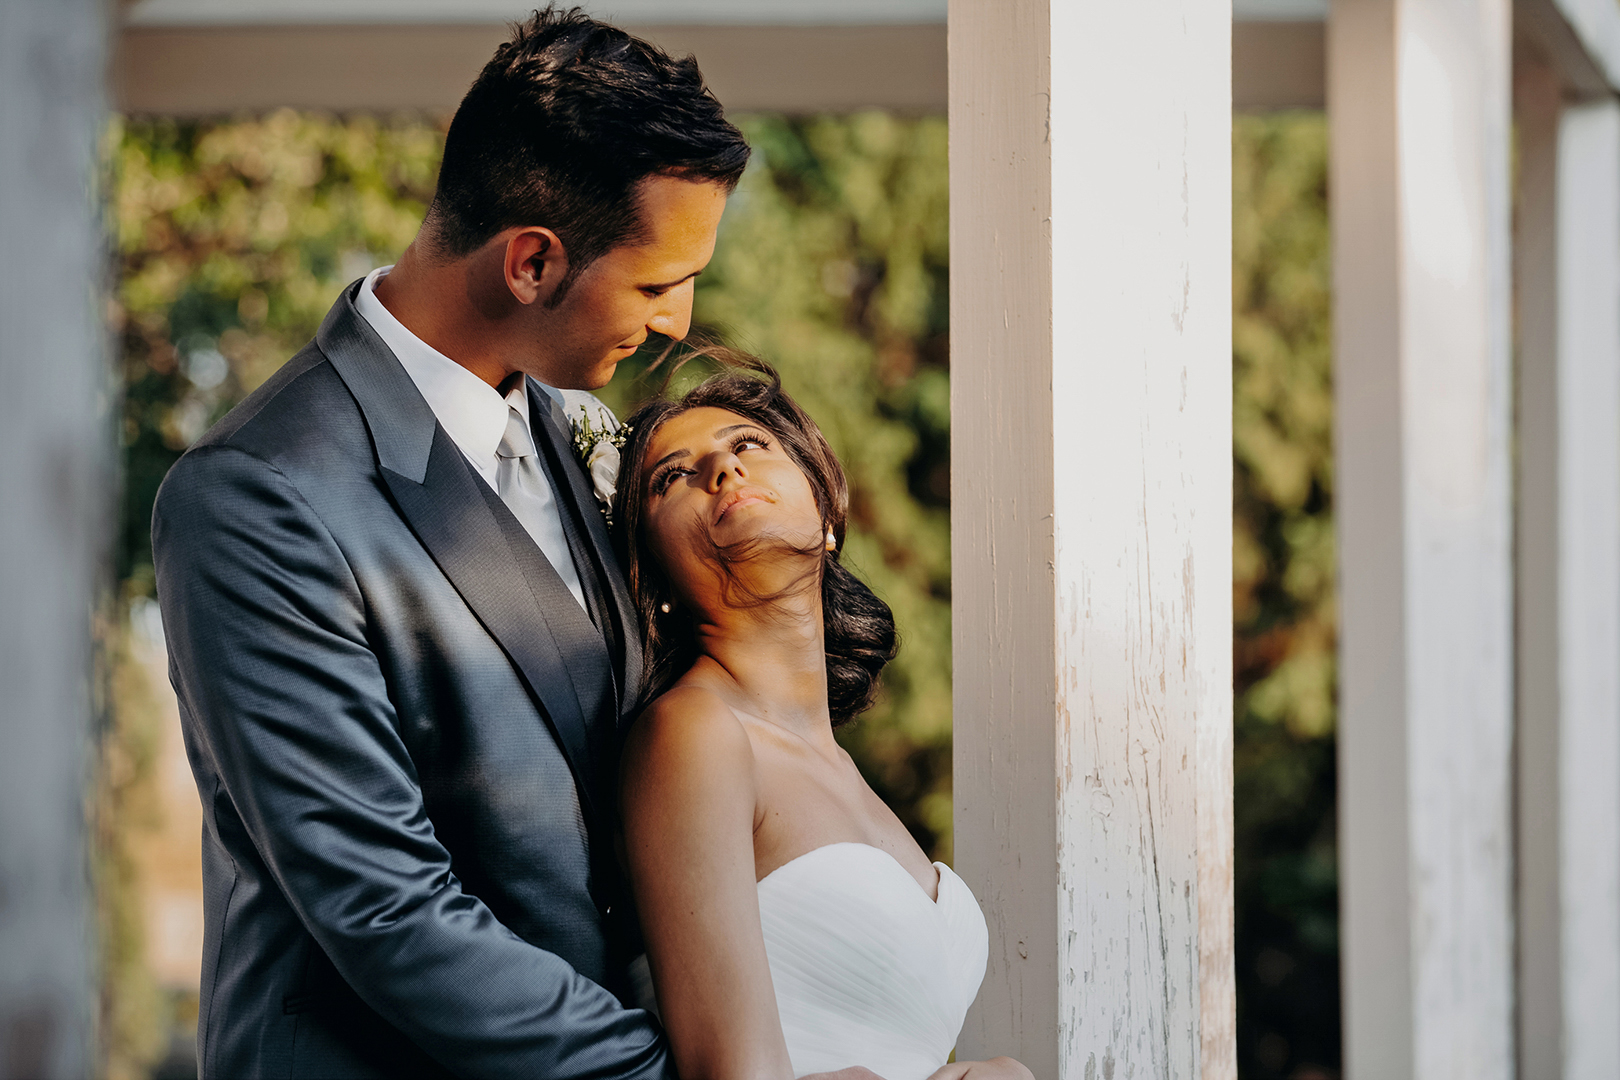 63 gianni-lepore-torre-di-posta-andriana-wedding